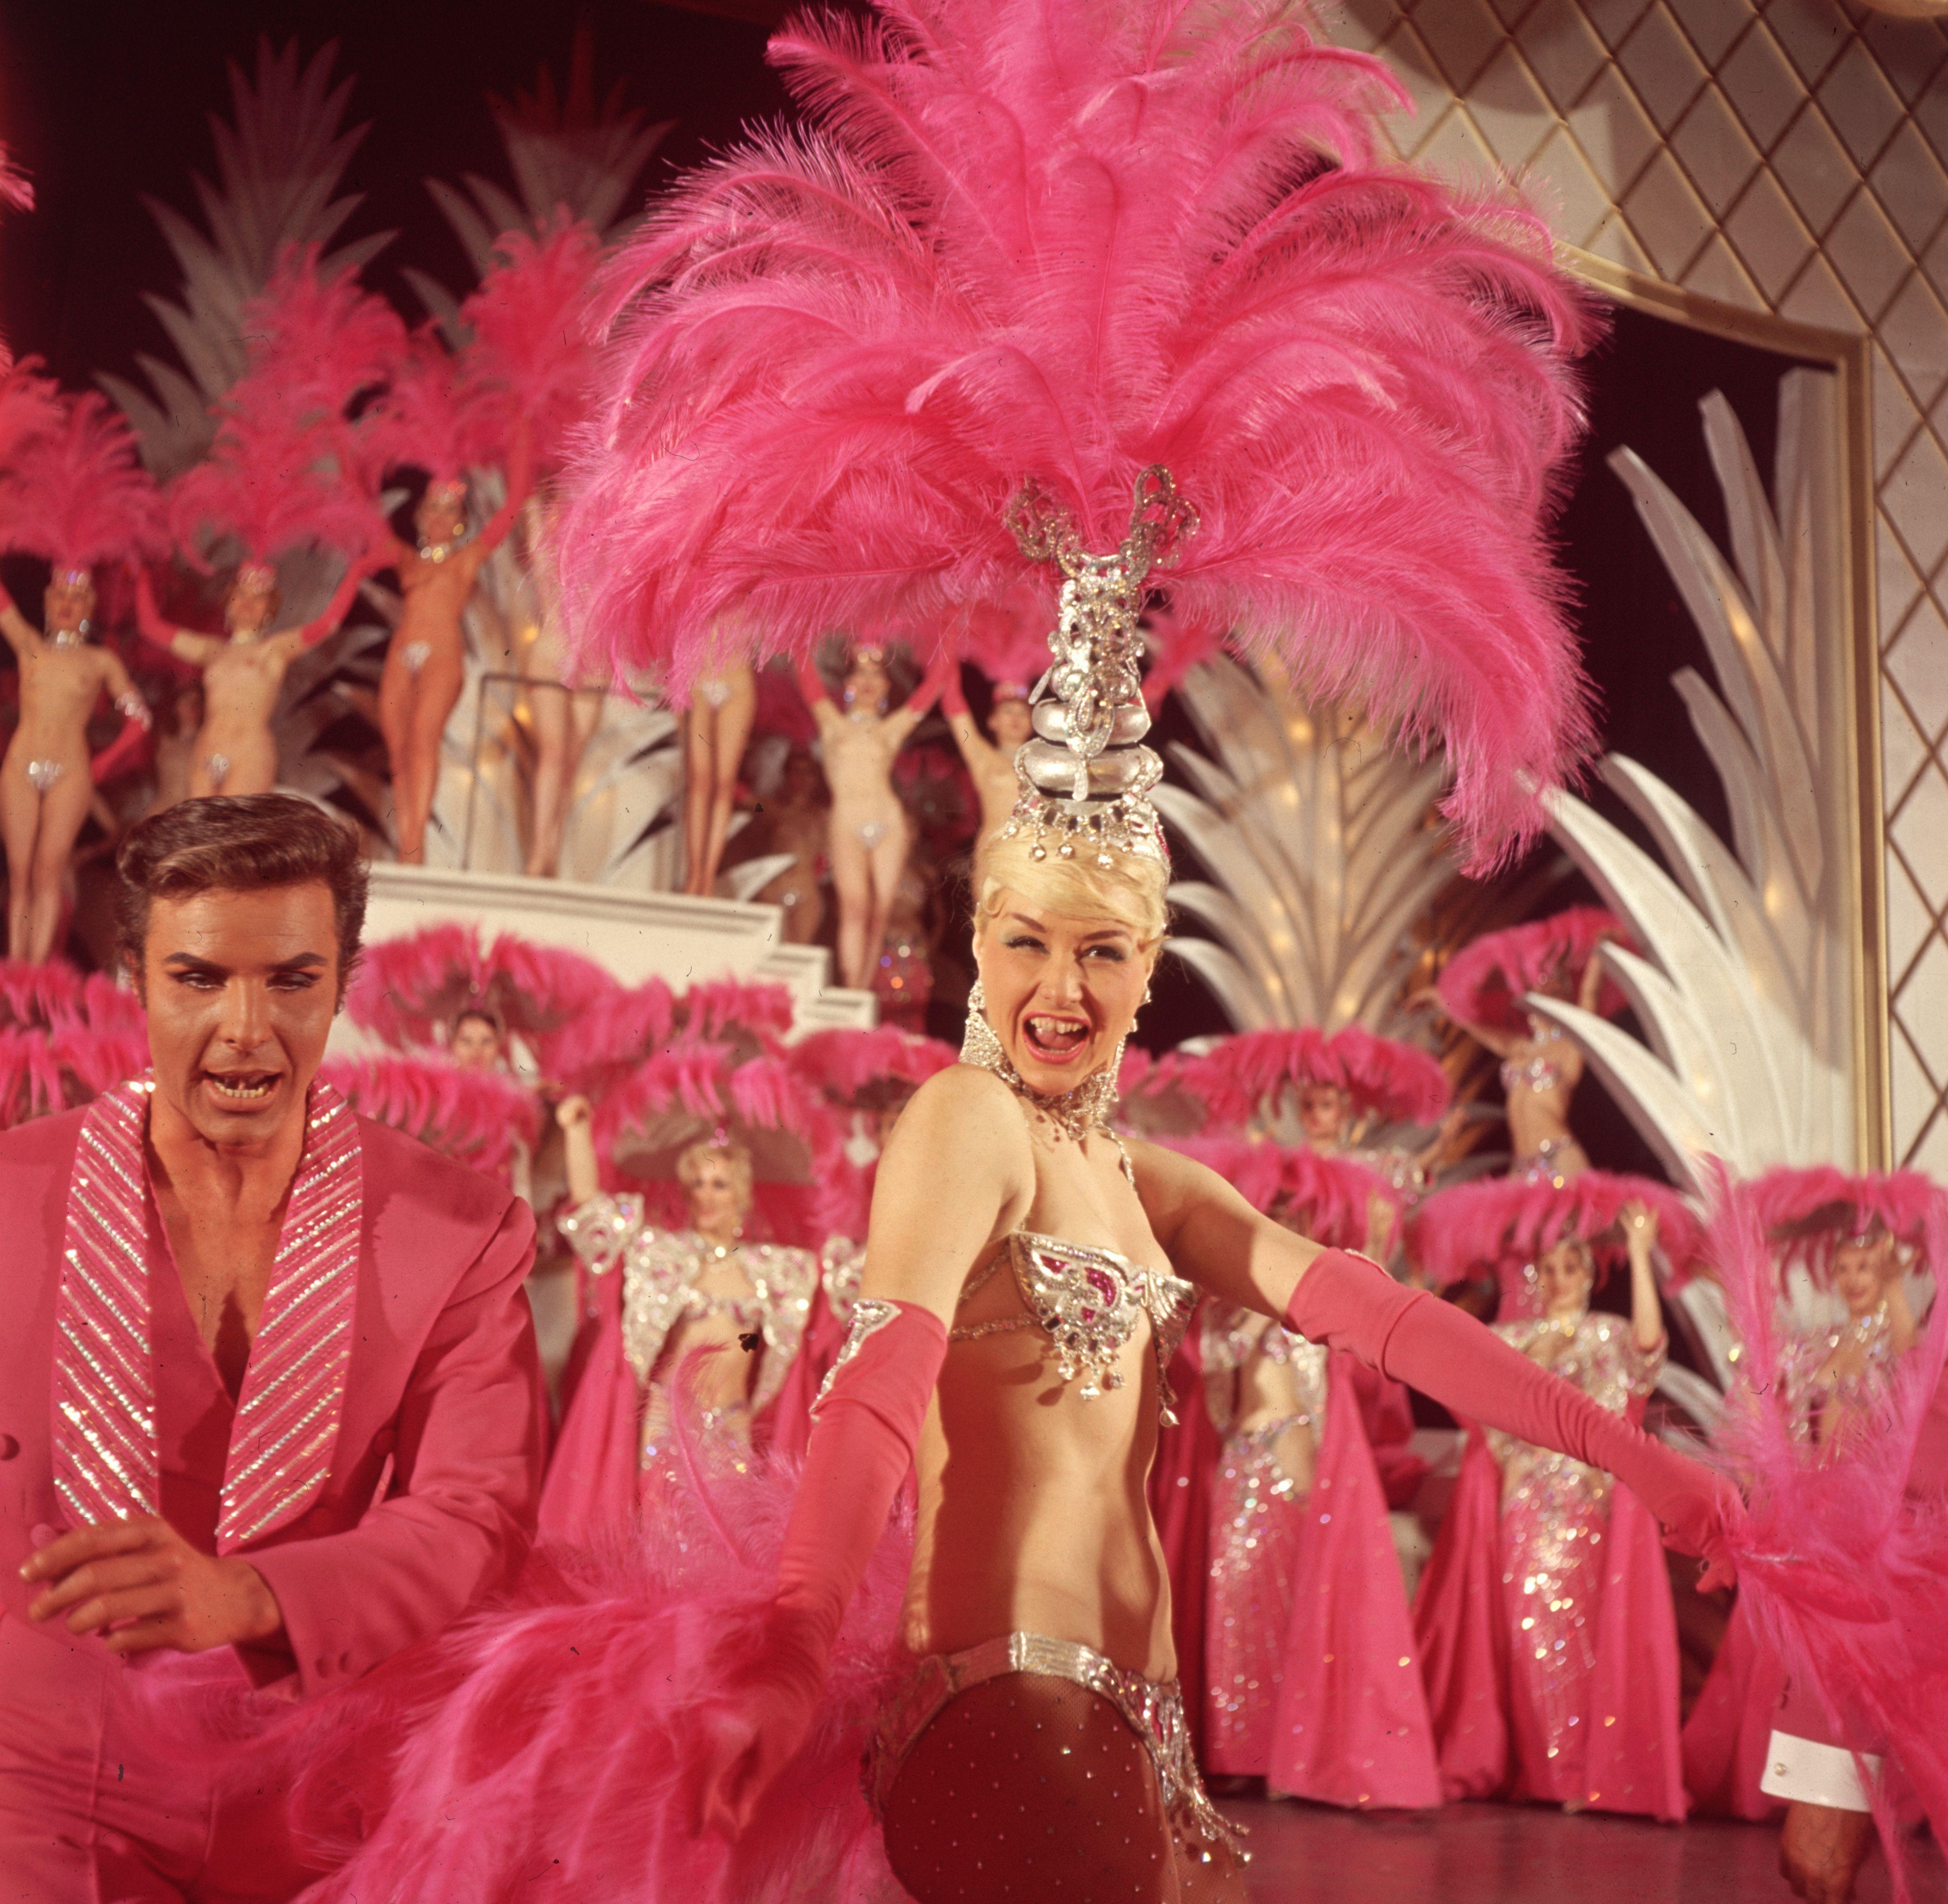 A cabaret show at the Folies Bergere